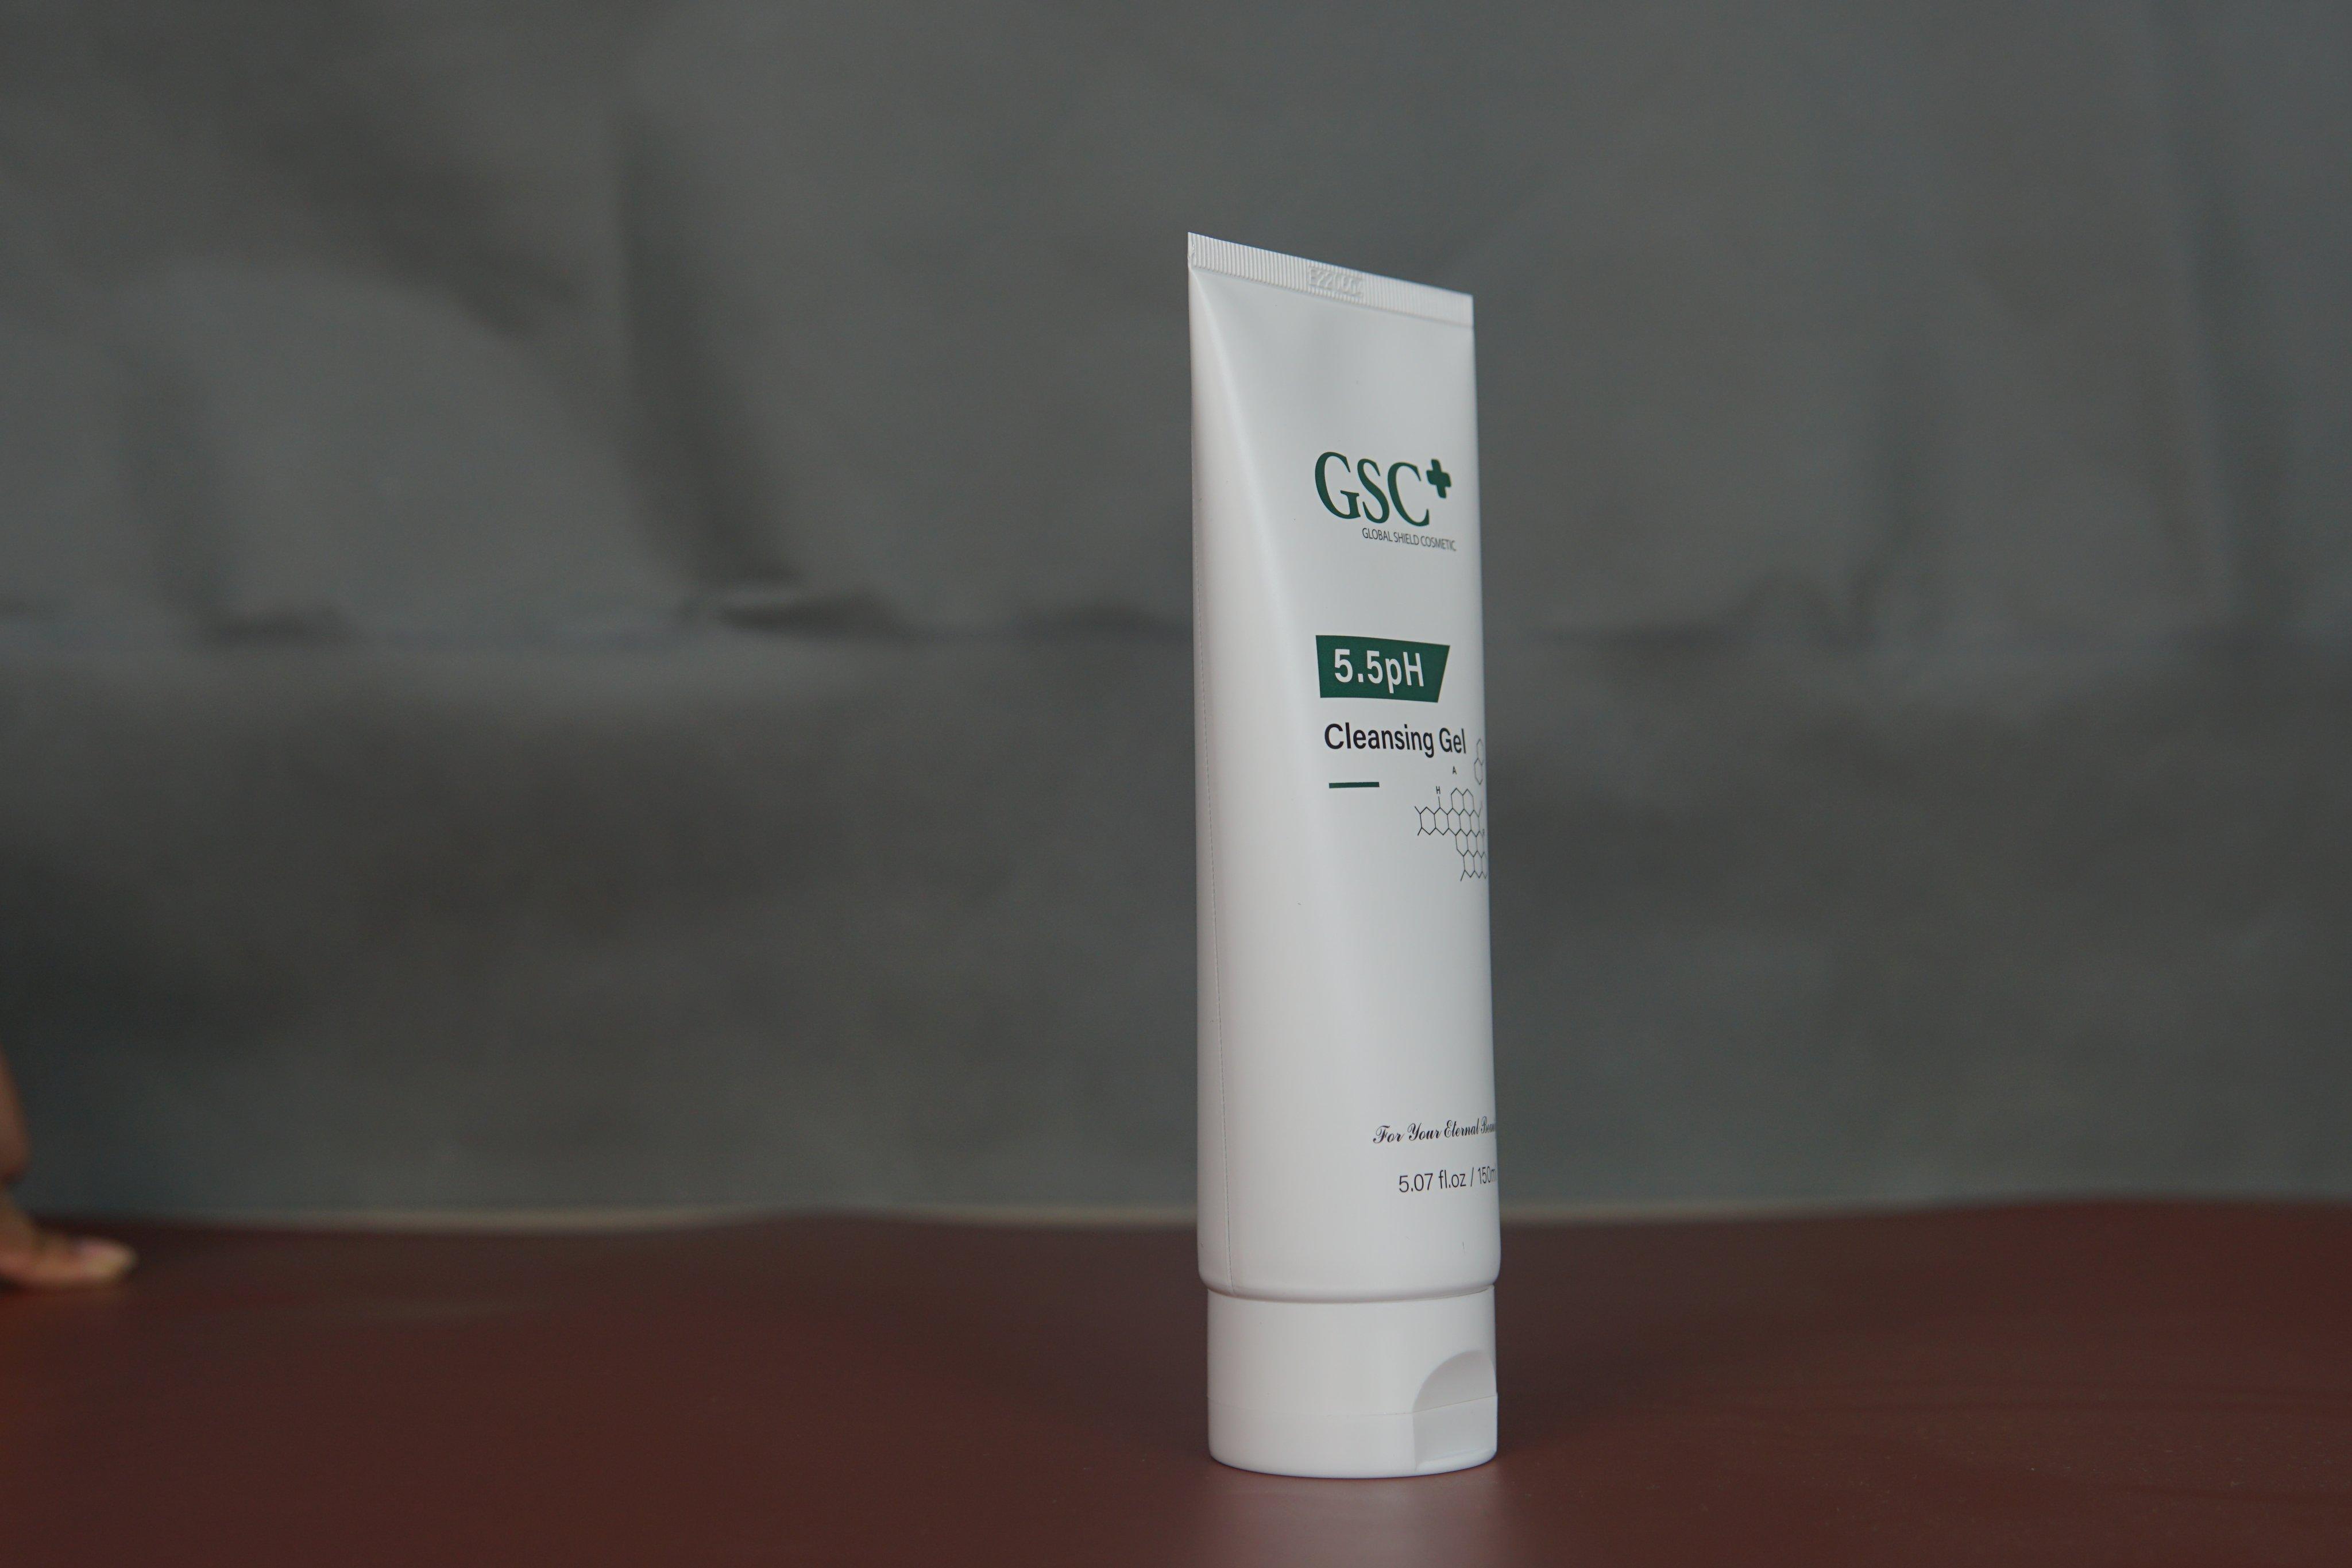 Sữa rửa mặt dạng Gel  GSC+ 5.5 pH Cleansing Gel 150ml